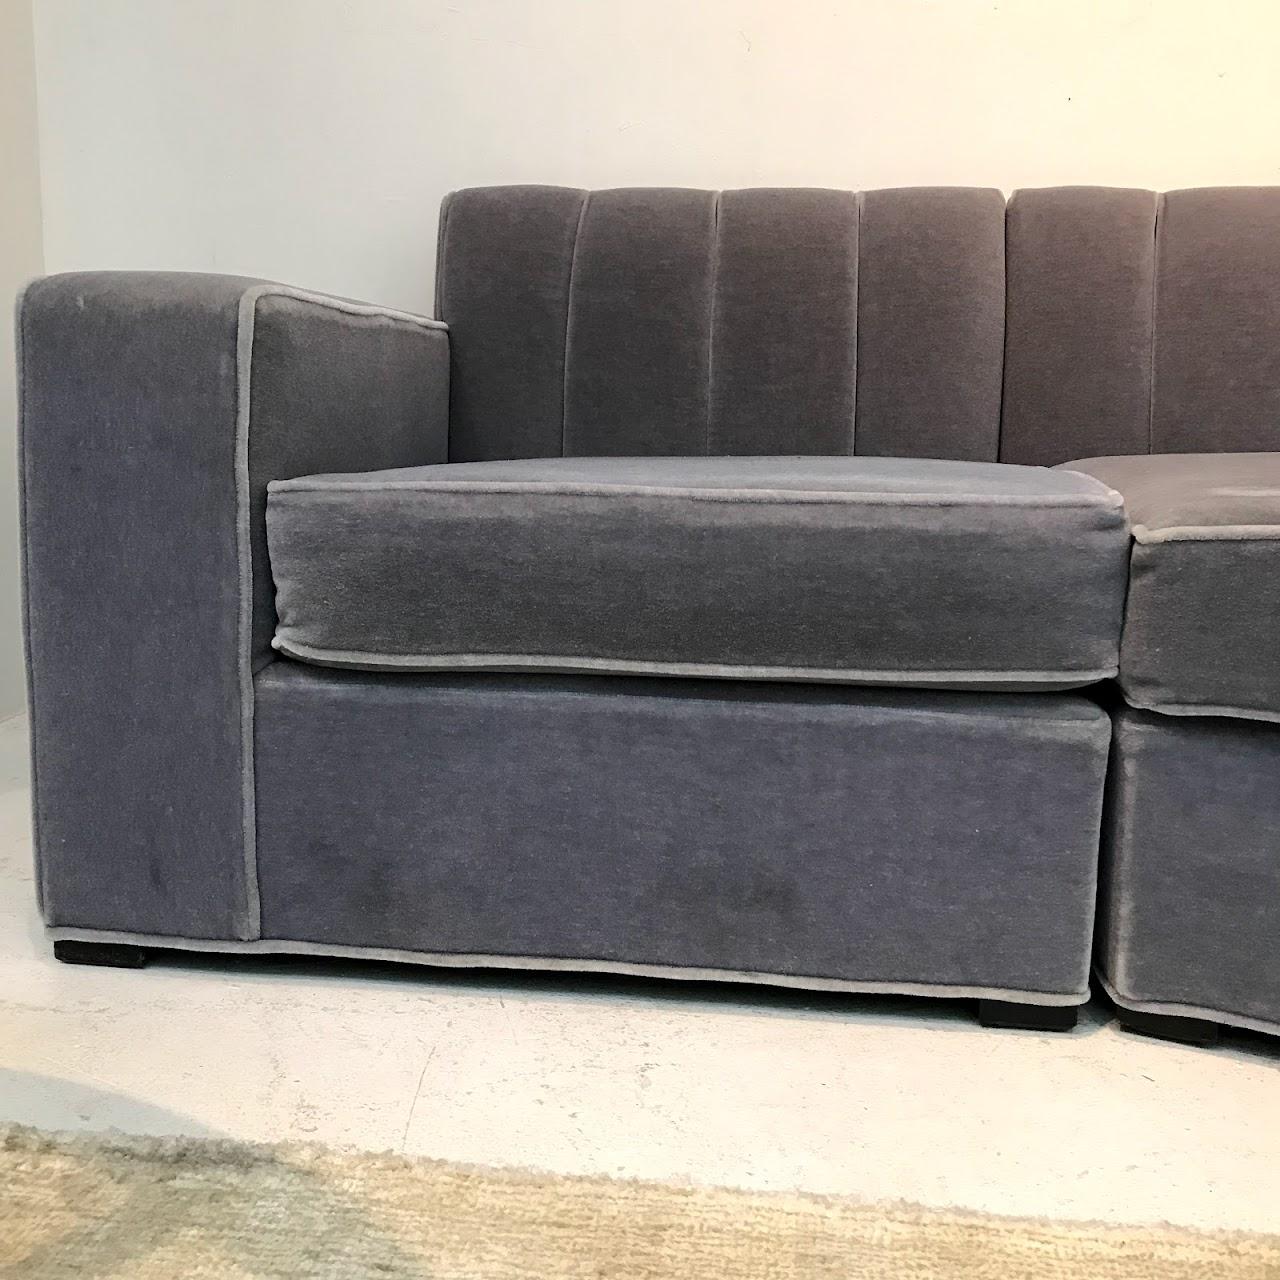 Superb Lilac Mohair Curved Sectional Sofa Shophousingworks Ibusinesslaw Wood Chair Design Ideas Ibusinesslaworg